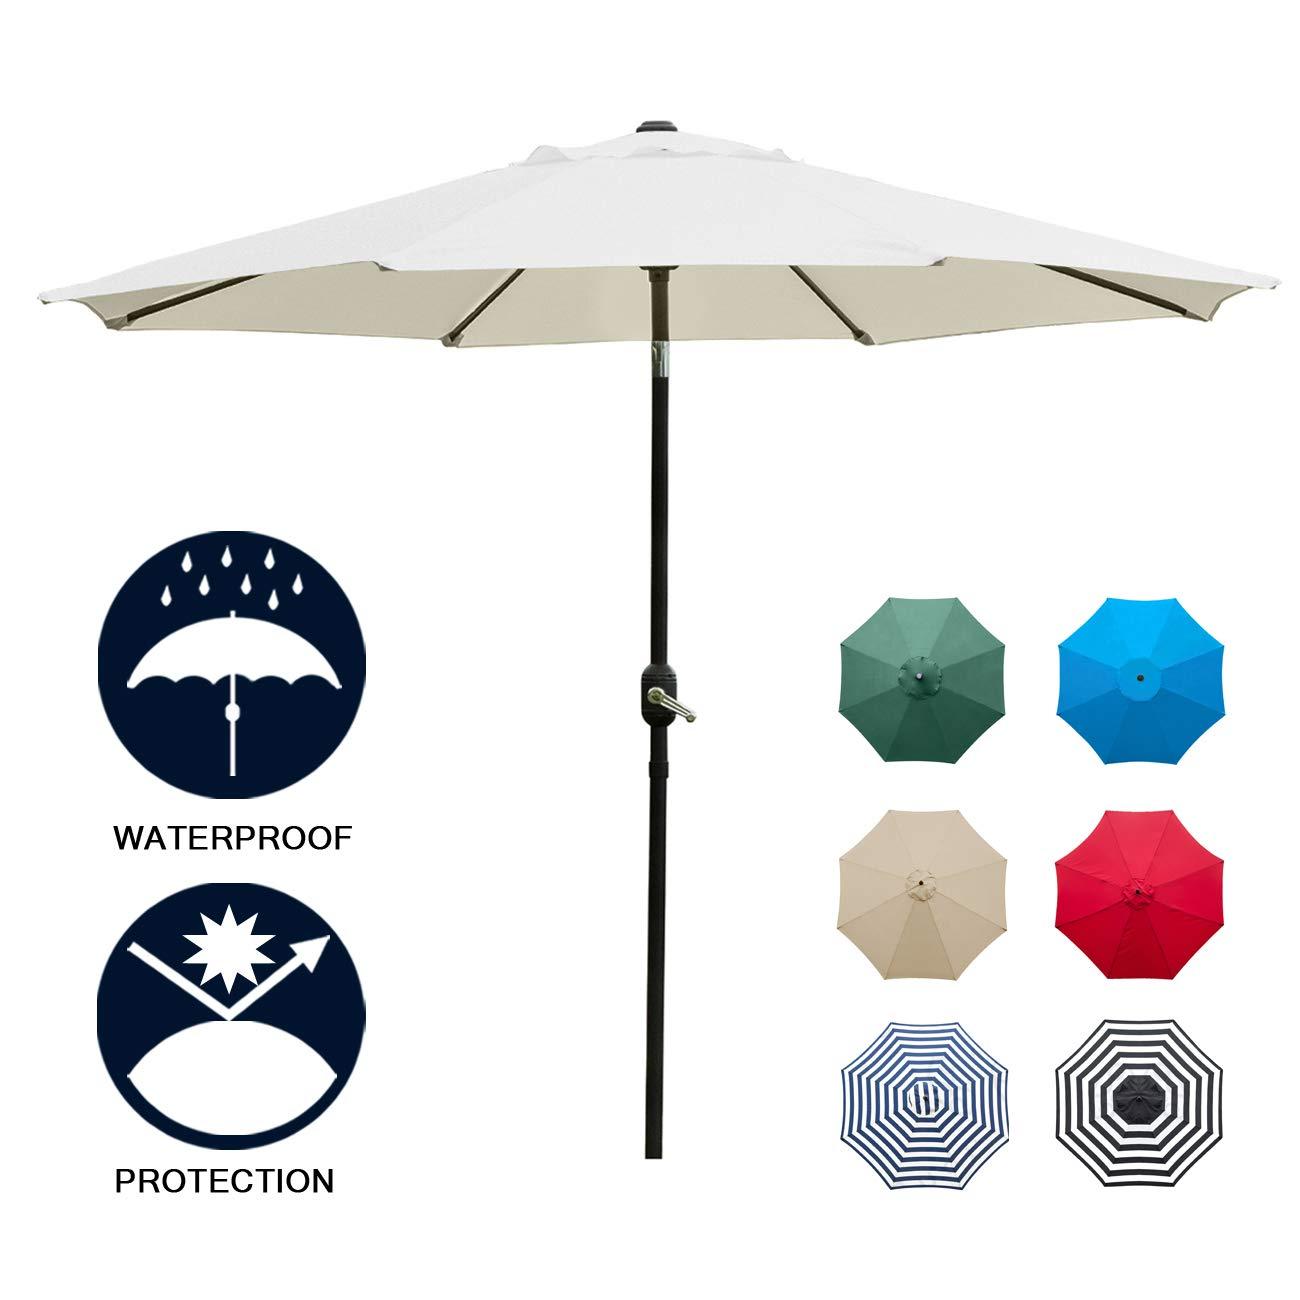 Sunnyglade 9 Patio Umbrella Outdoor Table Umbrella with 8 Sturdy Ribs (Beige)